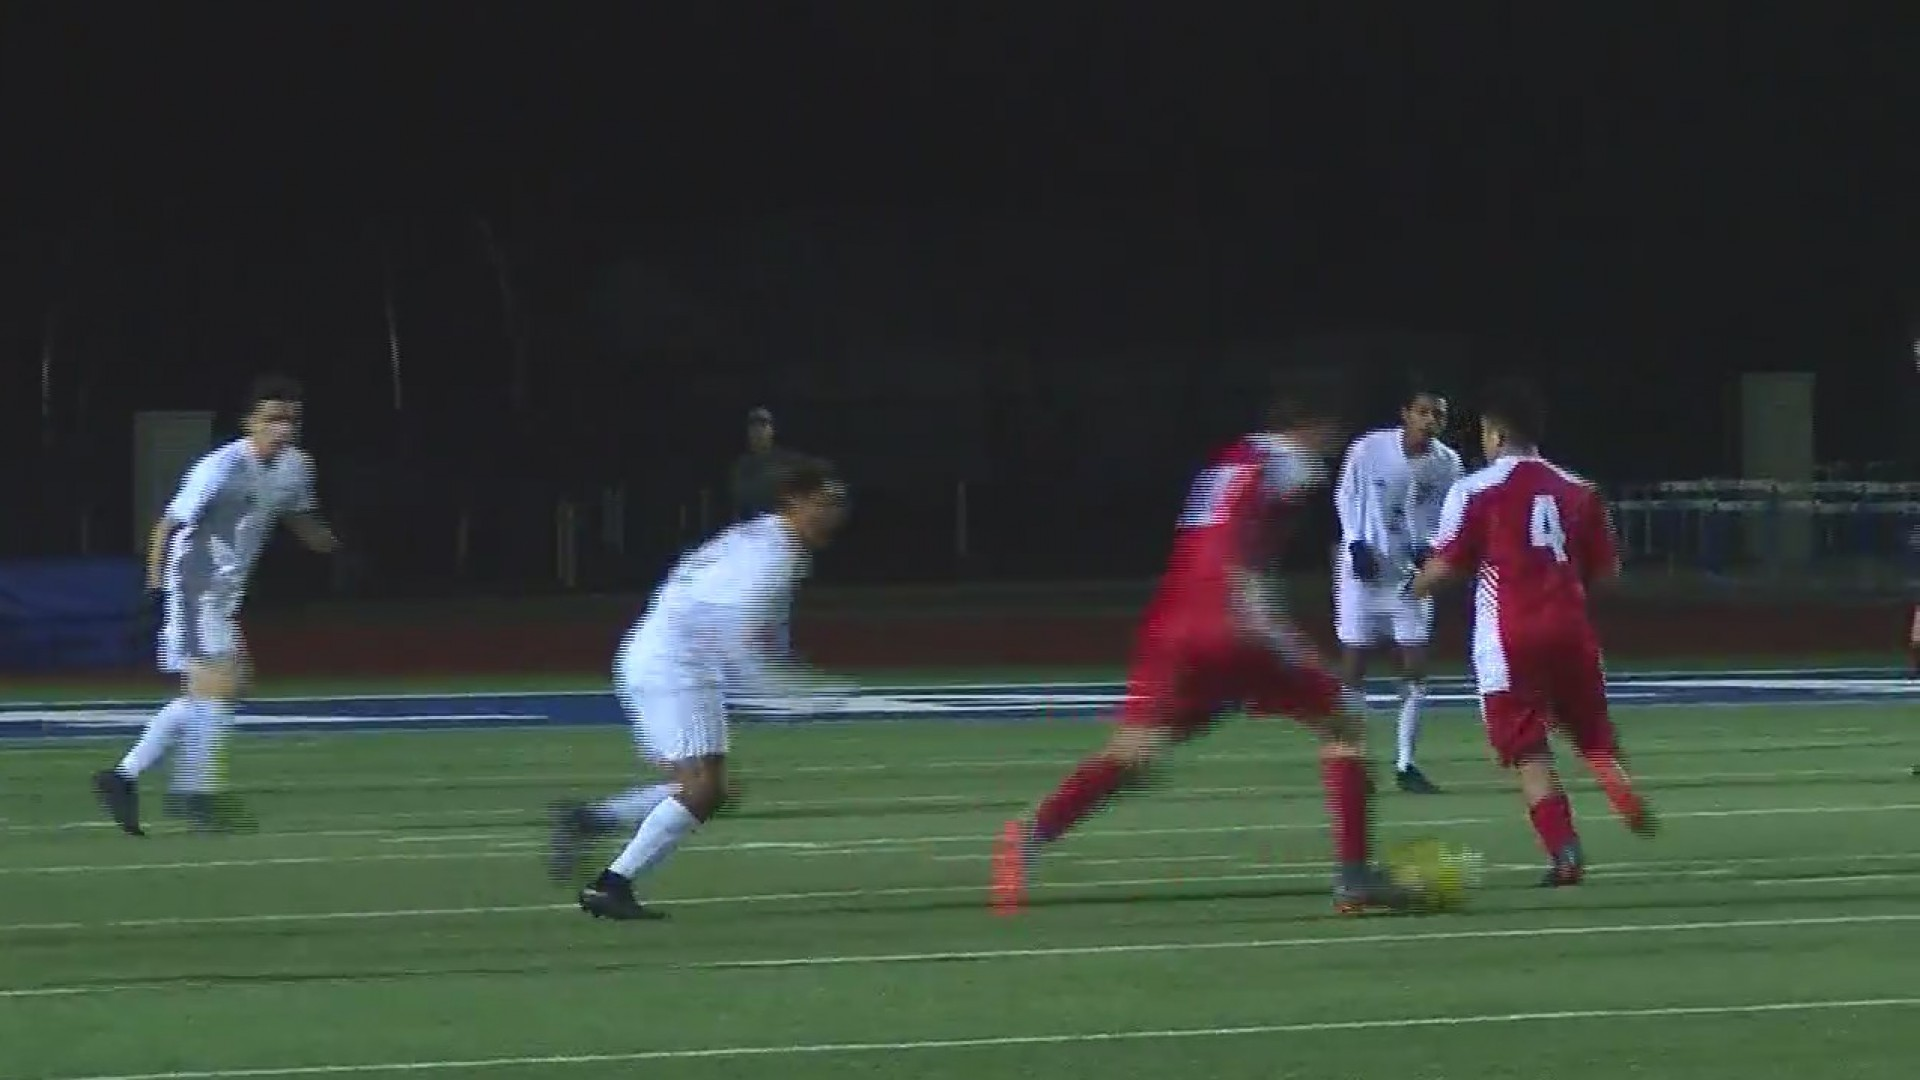 High_school_boys__soccer__Hirschi_vs__Gr_0_20190223045337